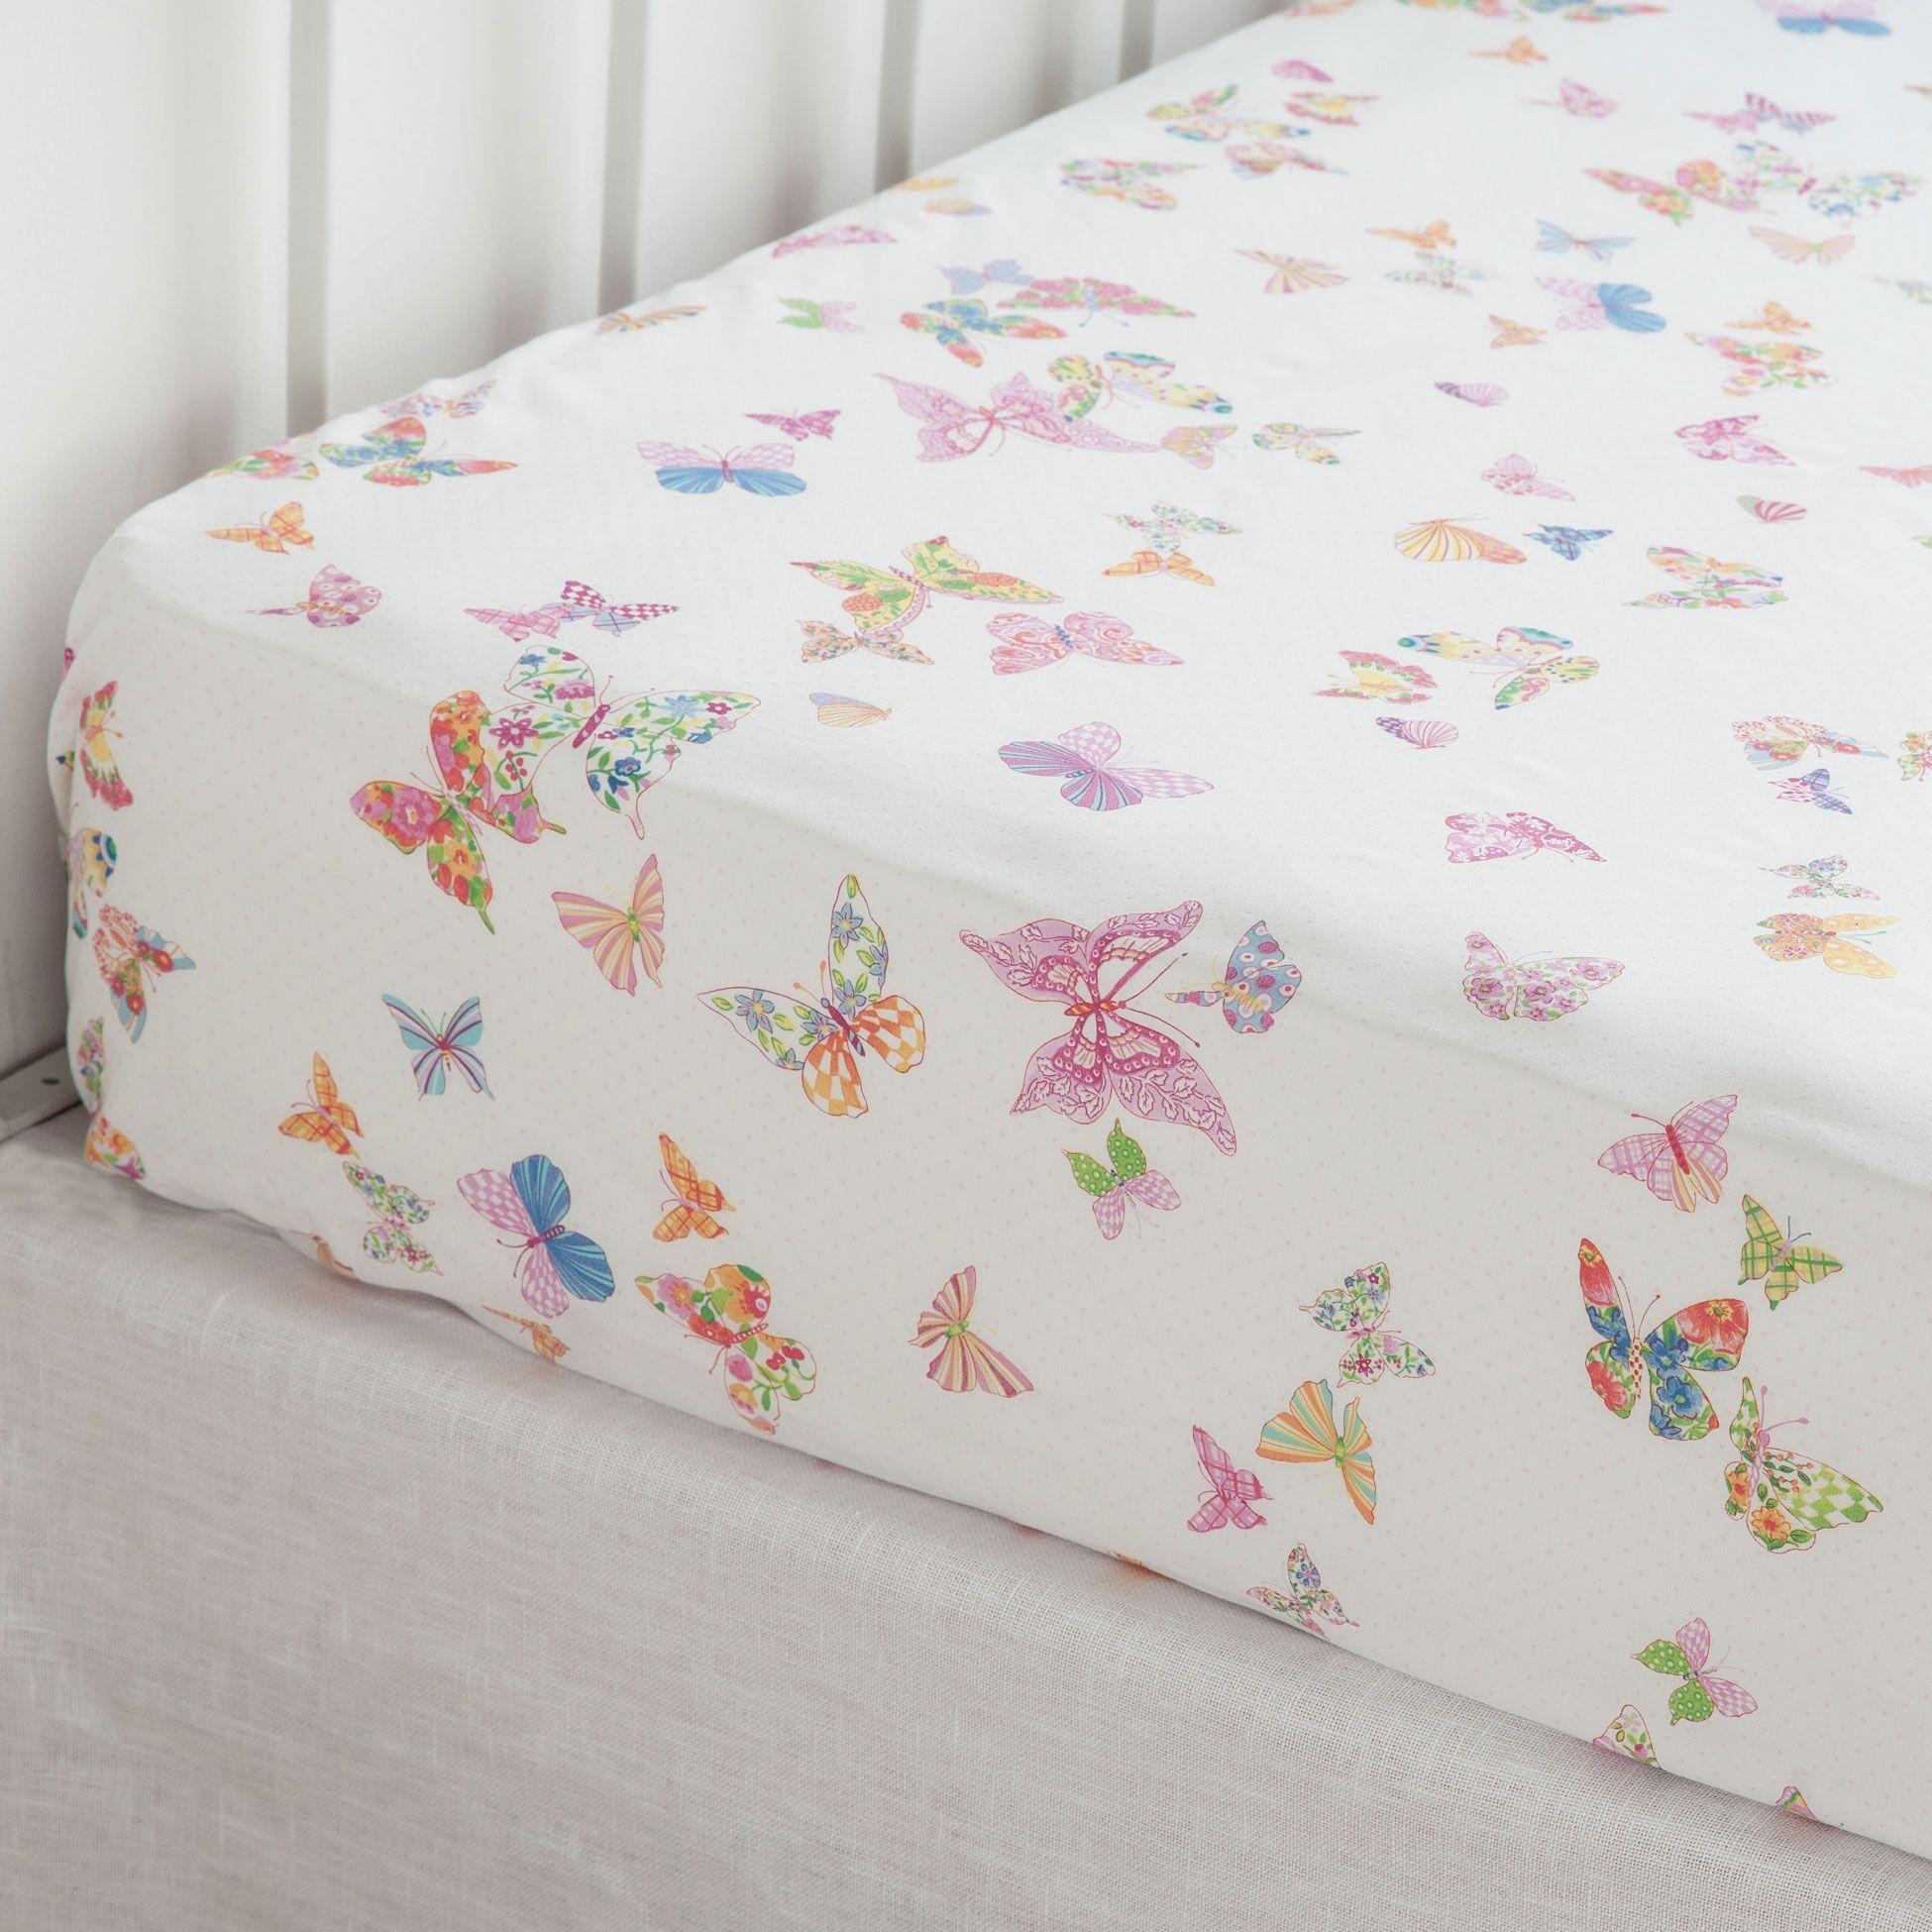 Funda Nordica Mariposas Zara Home.Pinterest